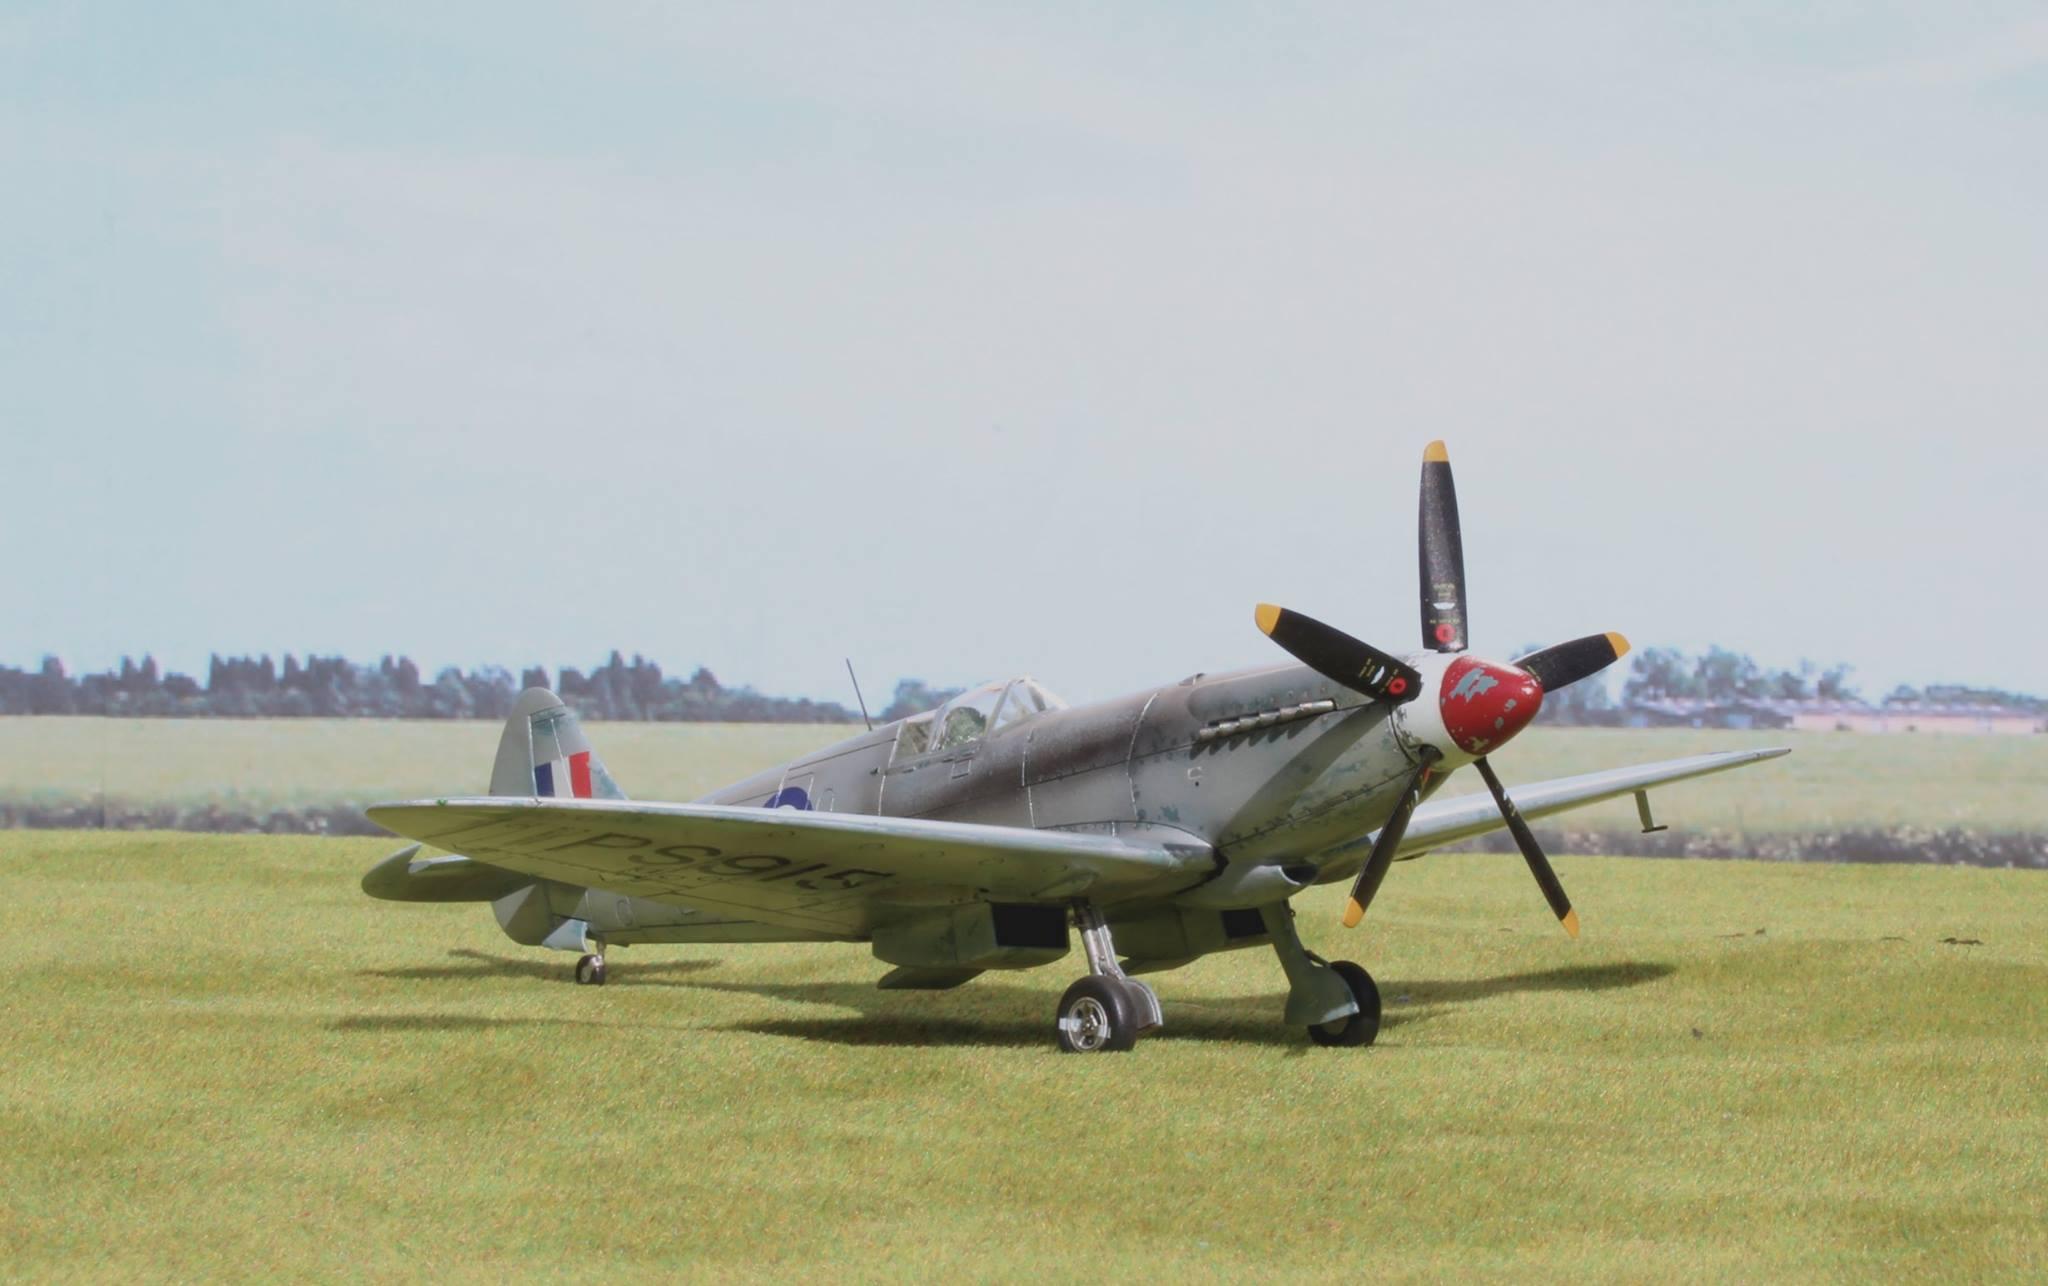 Spitfire Mk XIX (late)